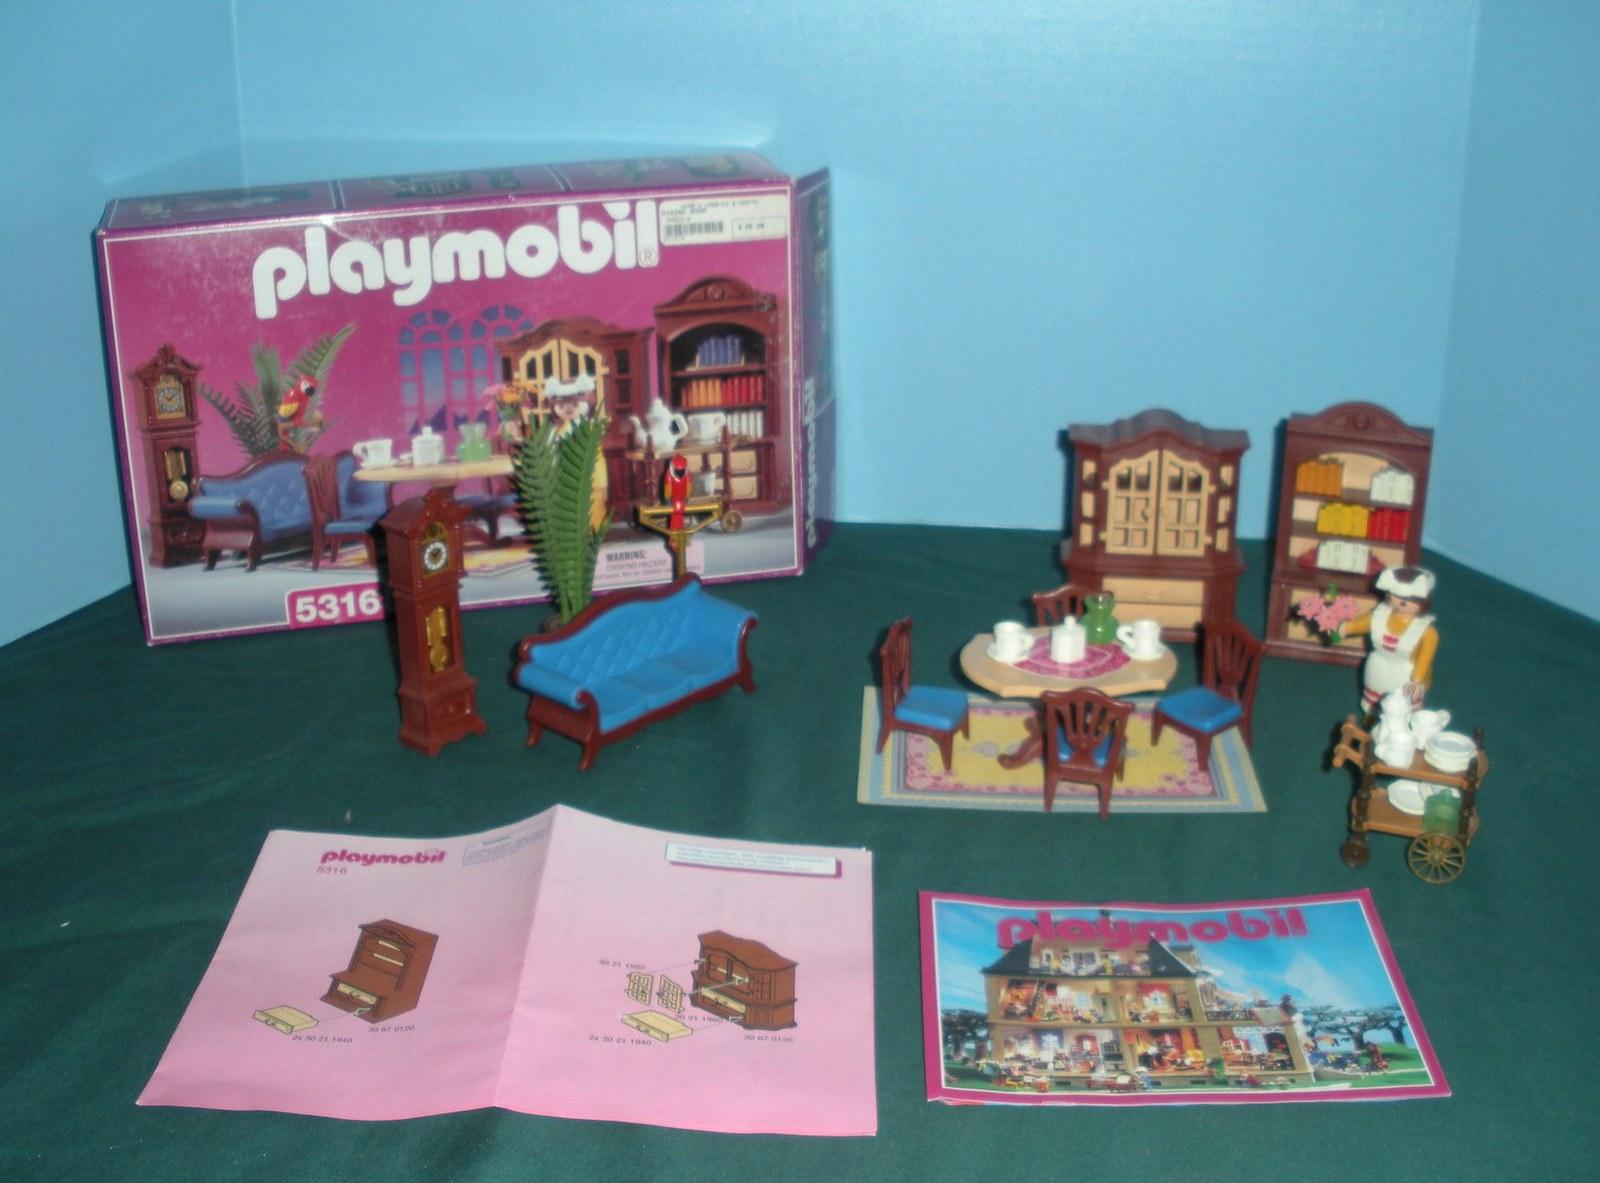 Vtg playmobil 5316 dining room 99 9 comp w box nr for Playmobil dining room 5335